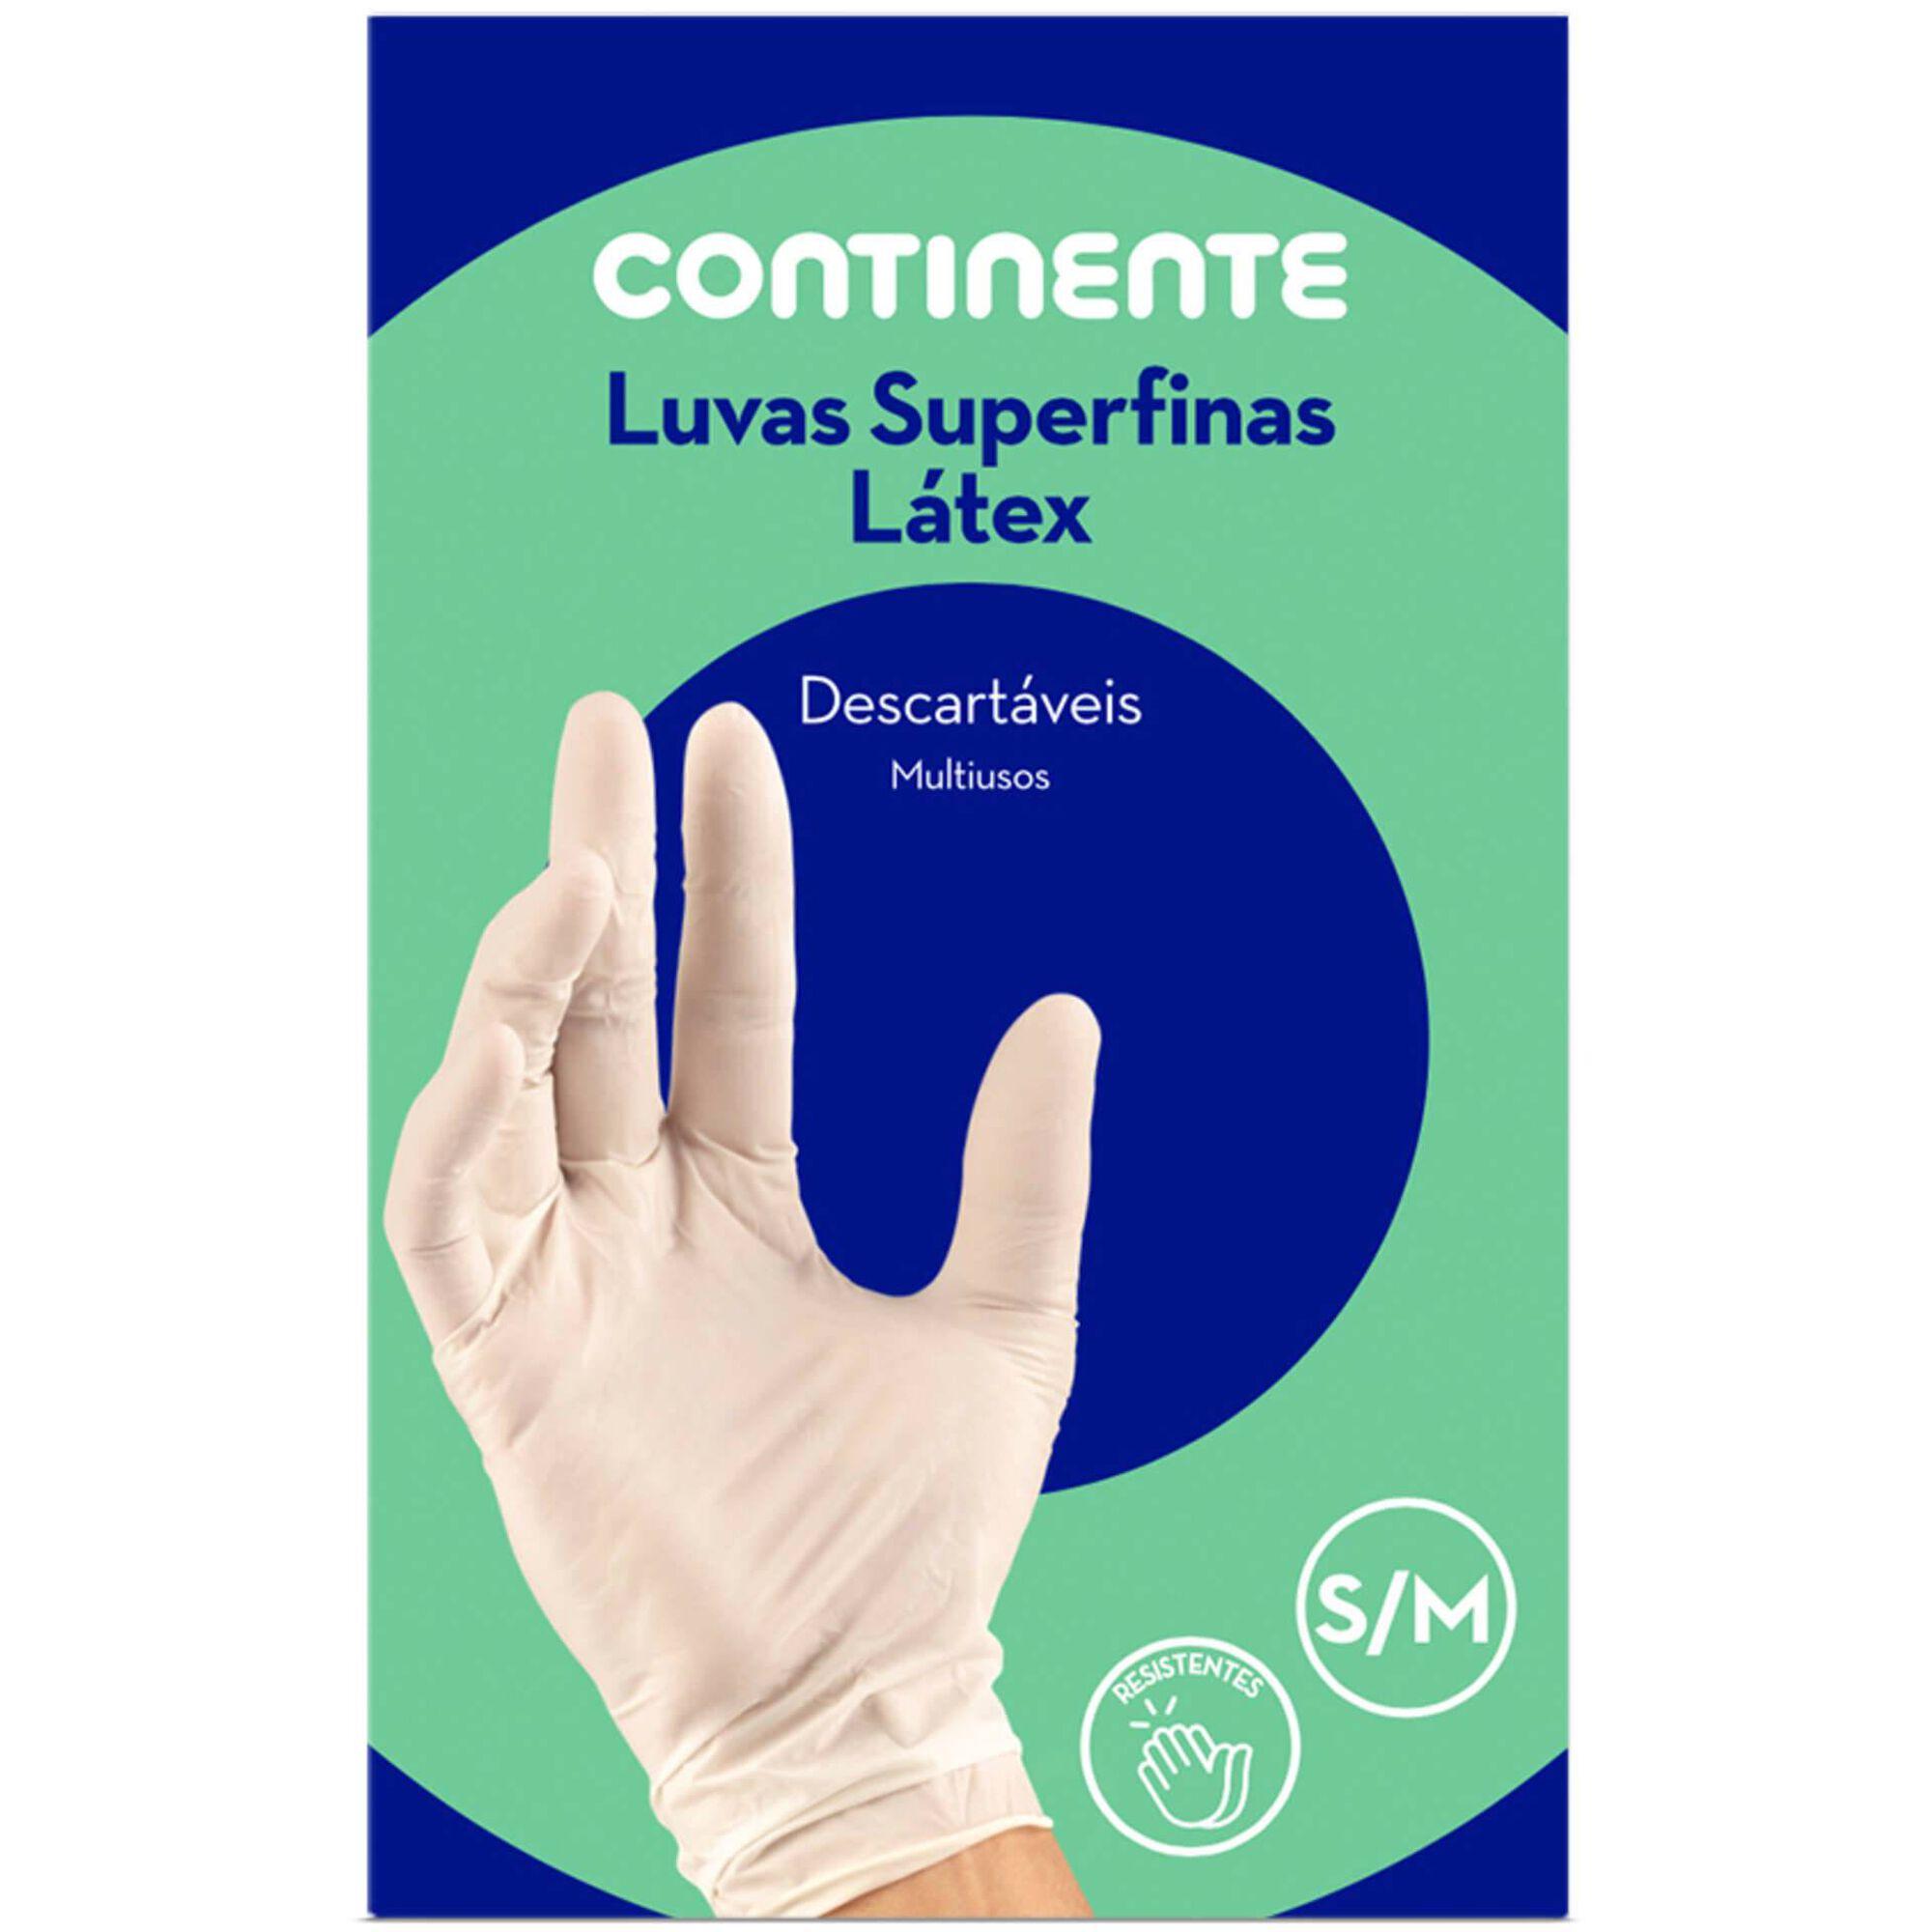 Luvas Descartáveis Superfinas Látex Tam. S/M